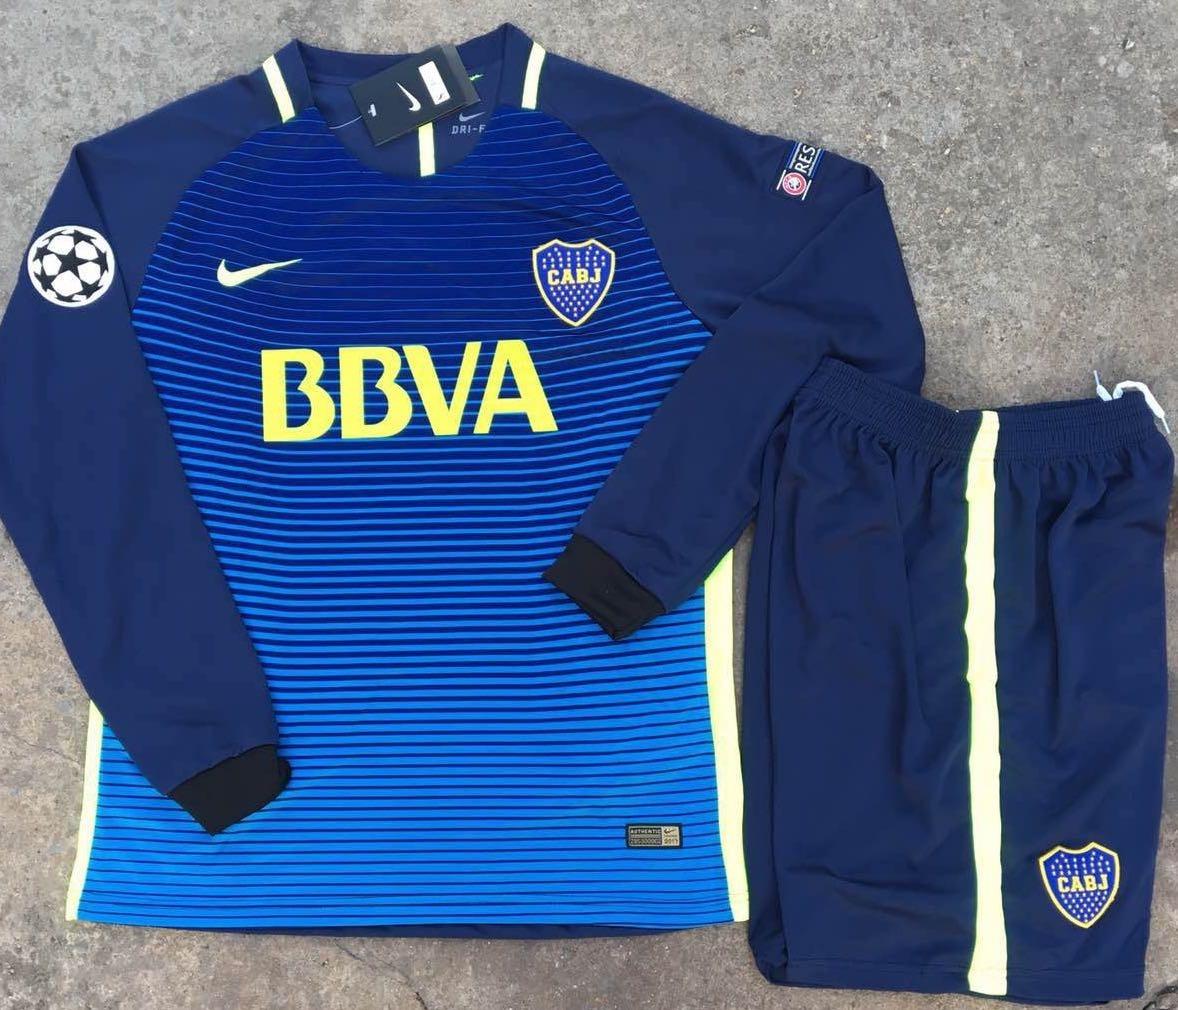 e6aa42f87b Uniforme De Fútbol Boca Juniors Manga Larga -   39.900 en Mercado Libre